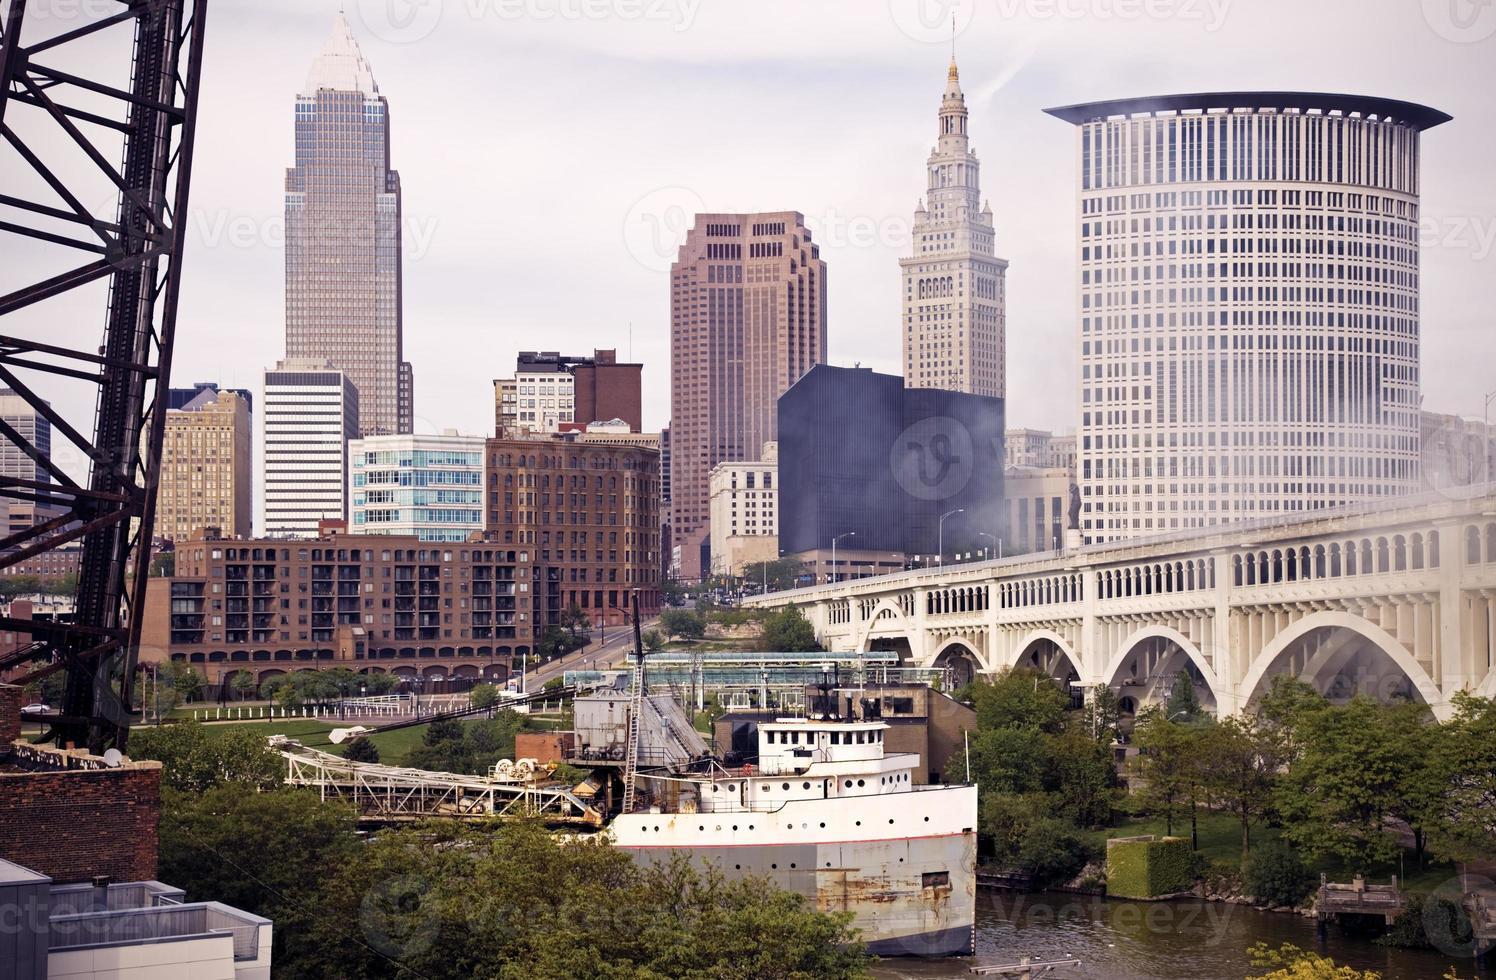 großes Schiff am Cuyahoga River foto